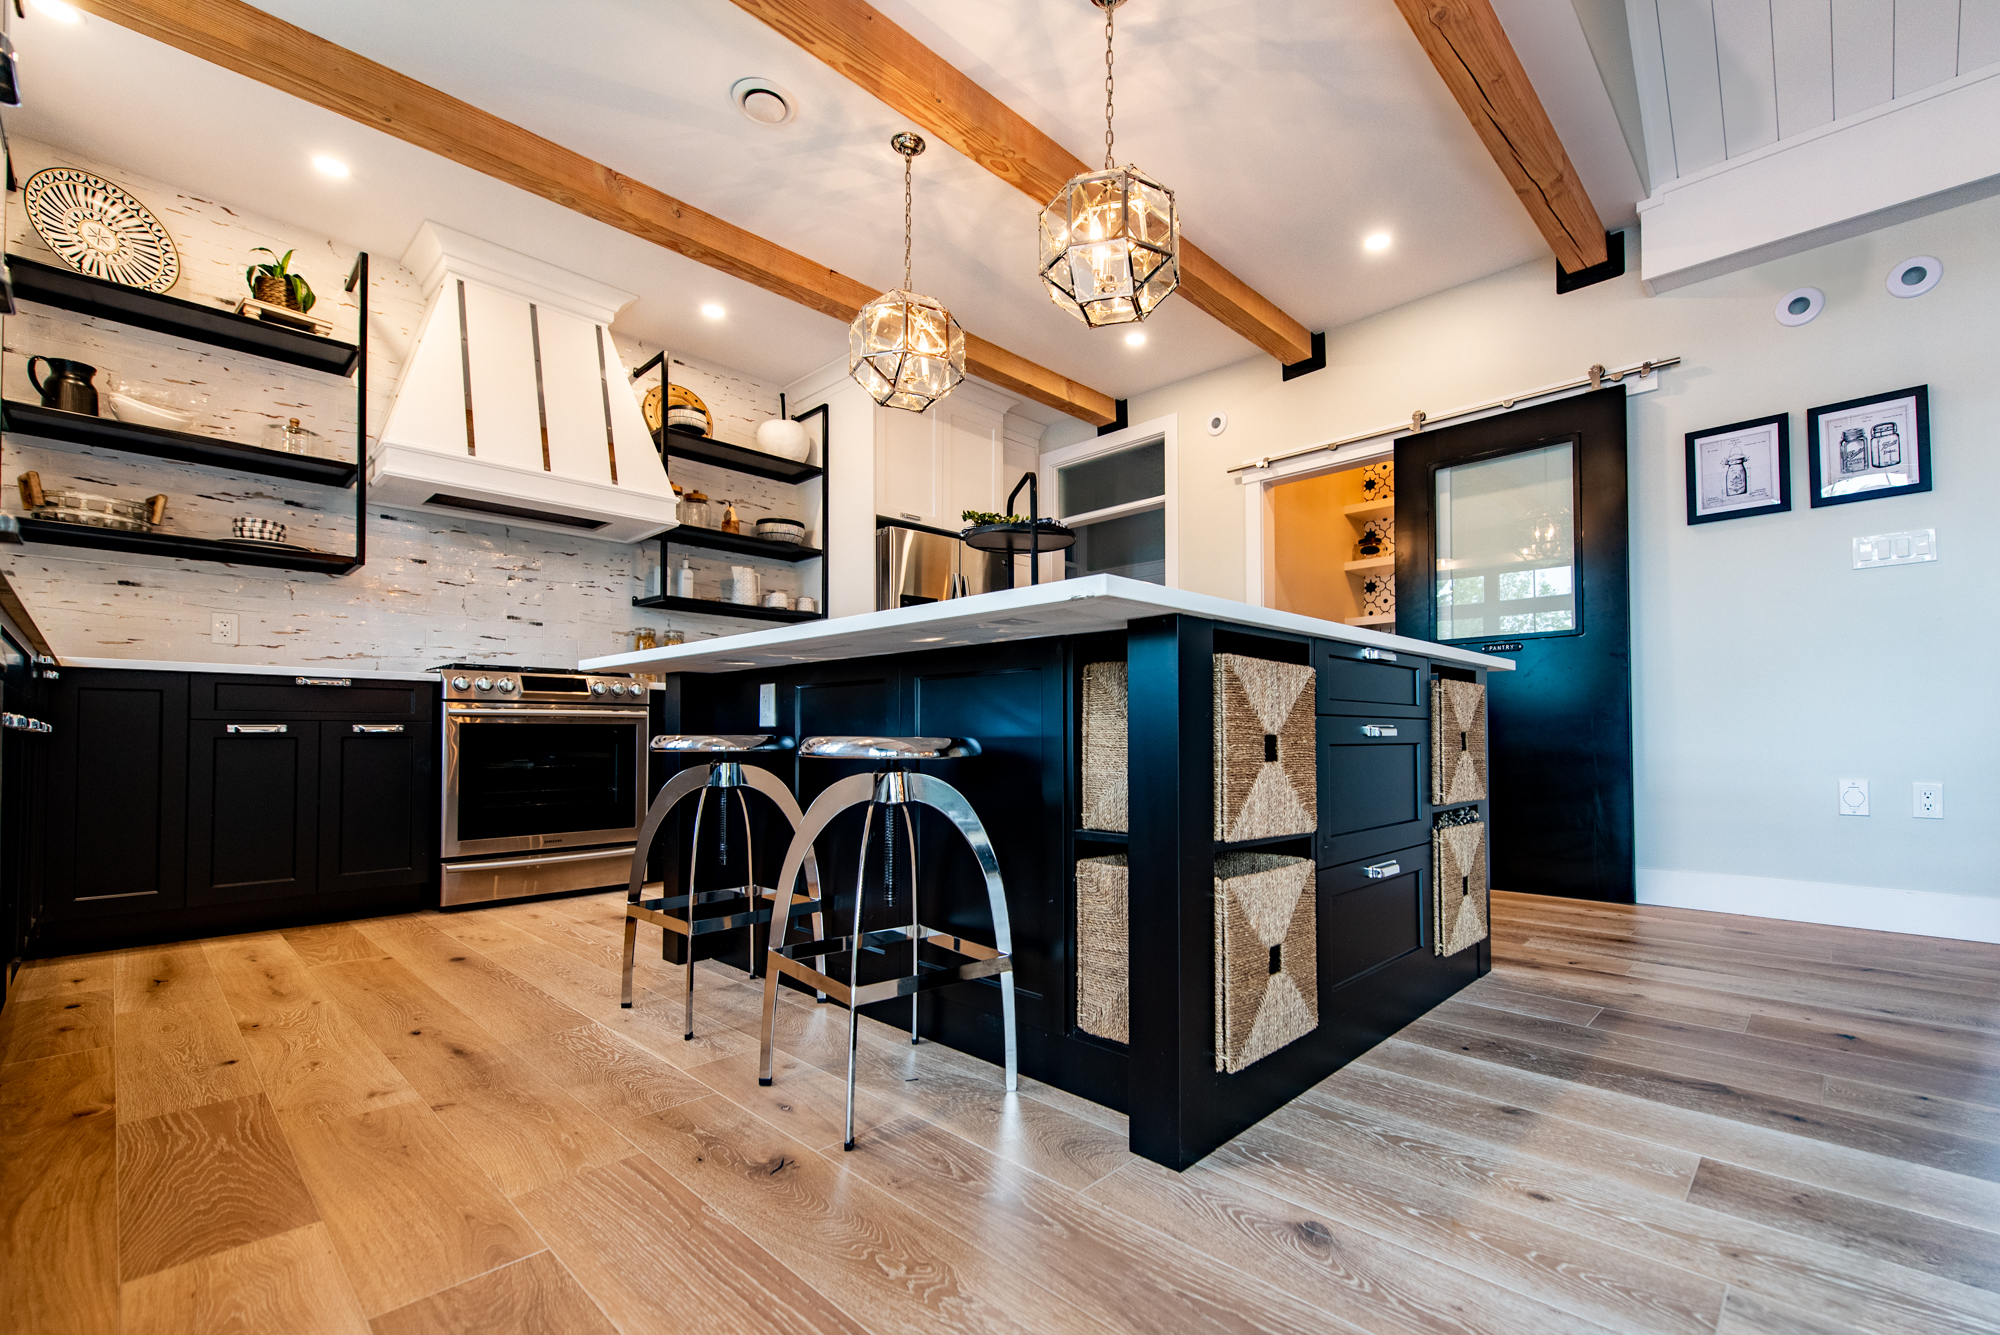 Kitchen diningDAC_7035-HDR_.jpg